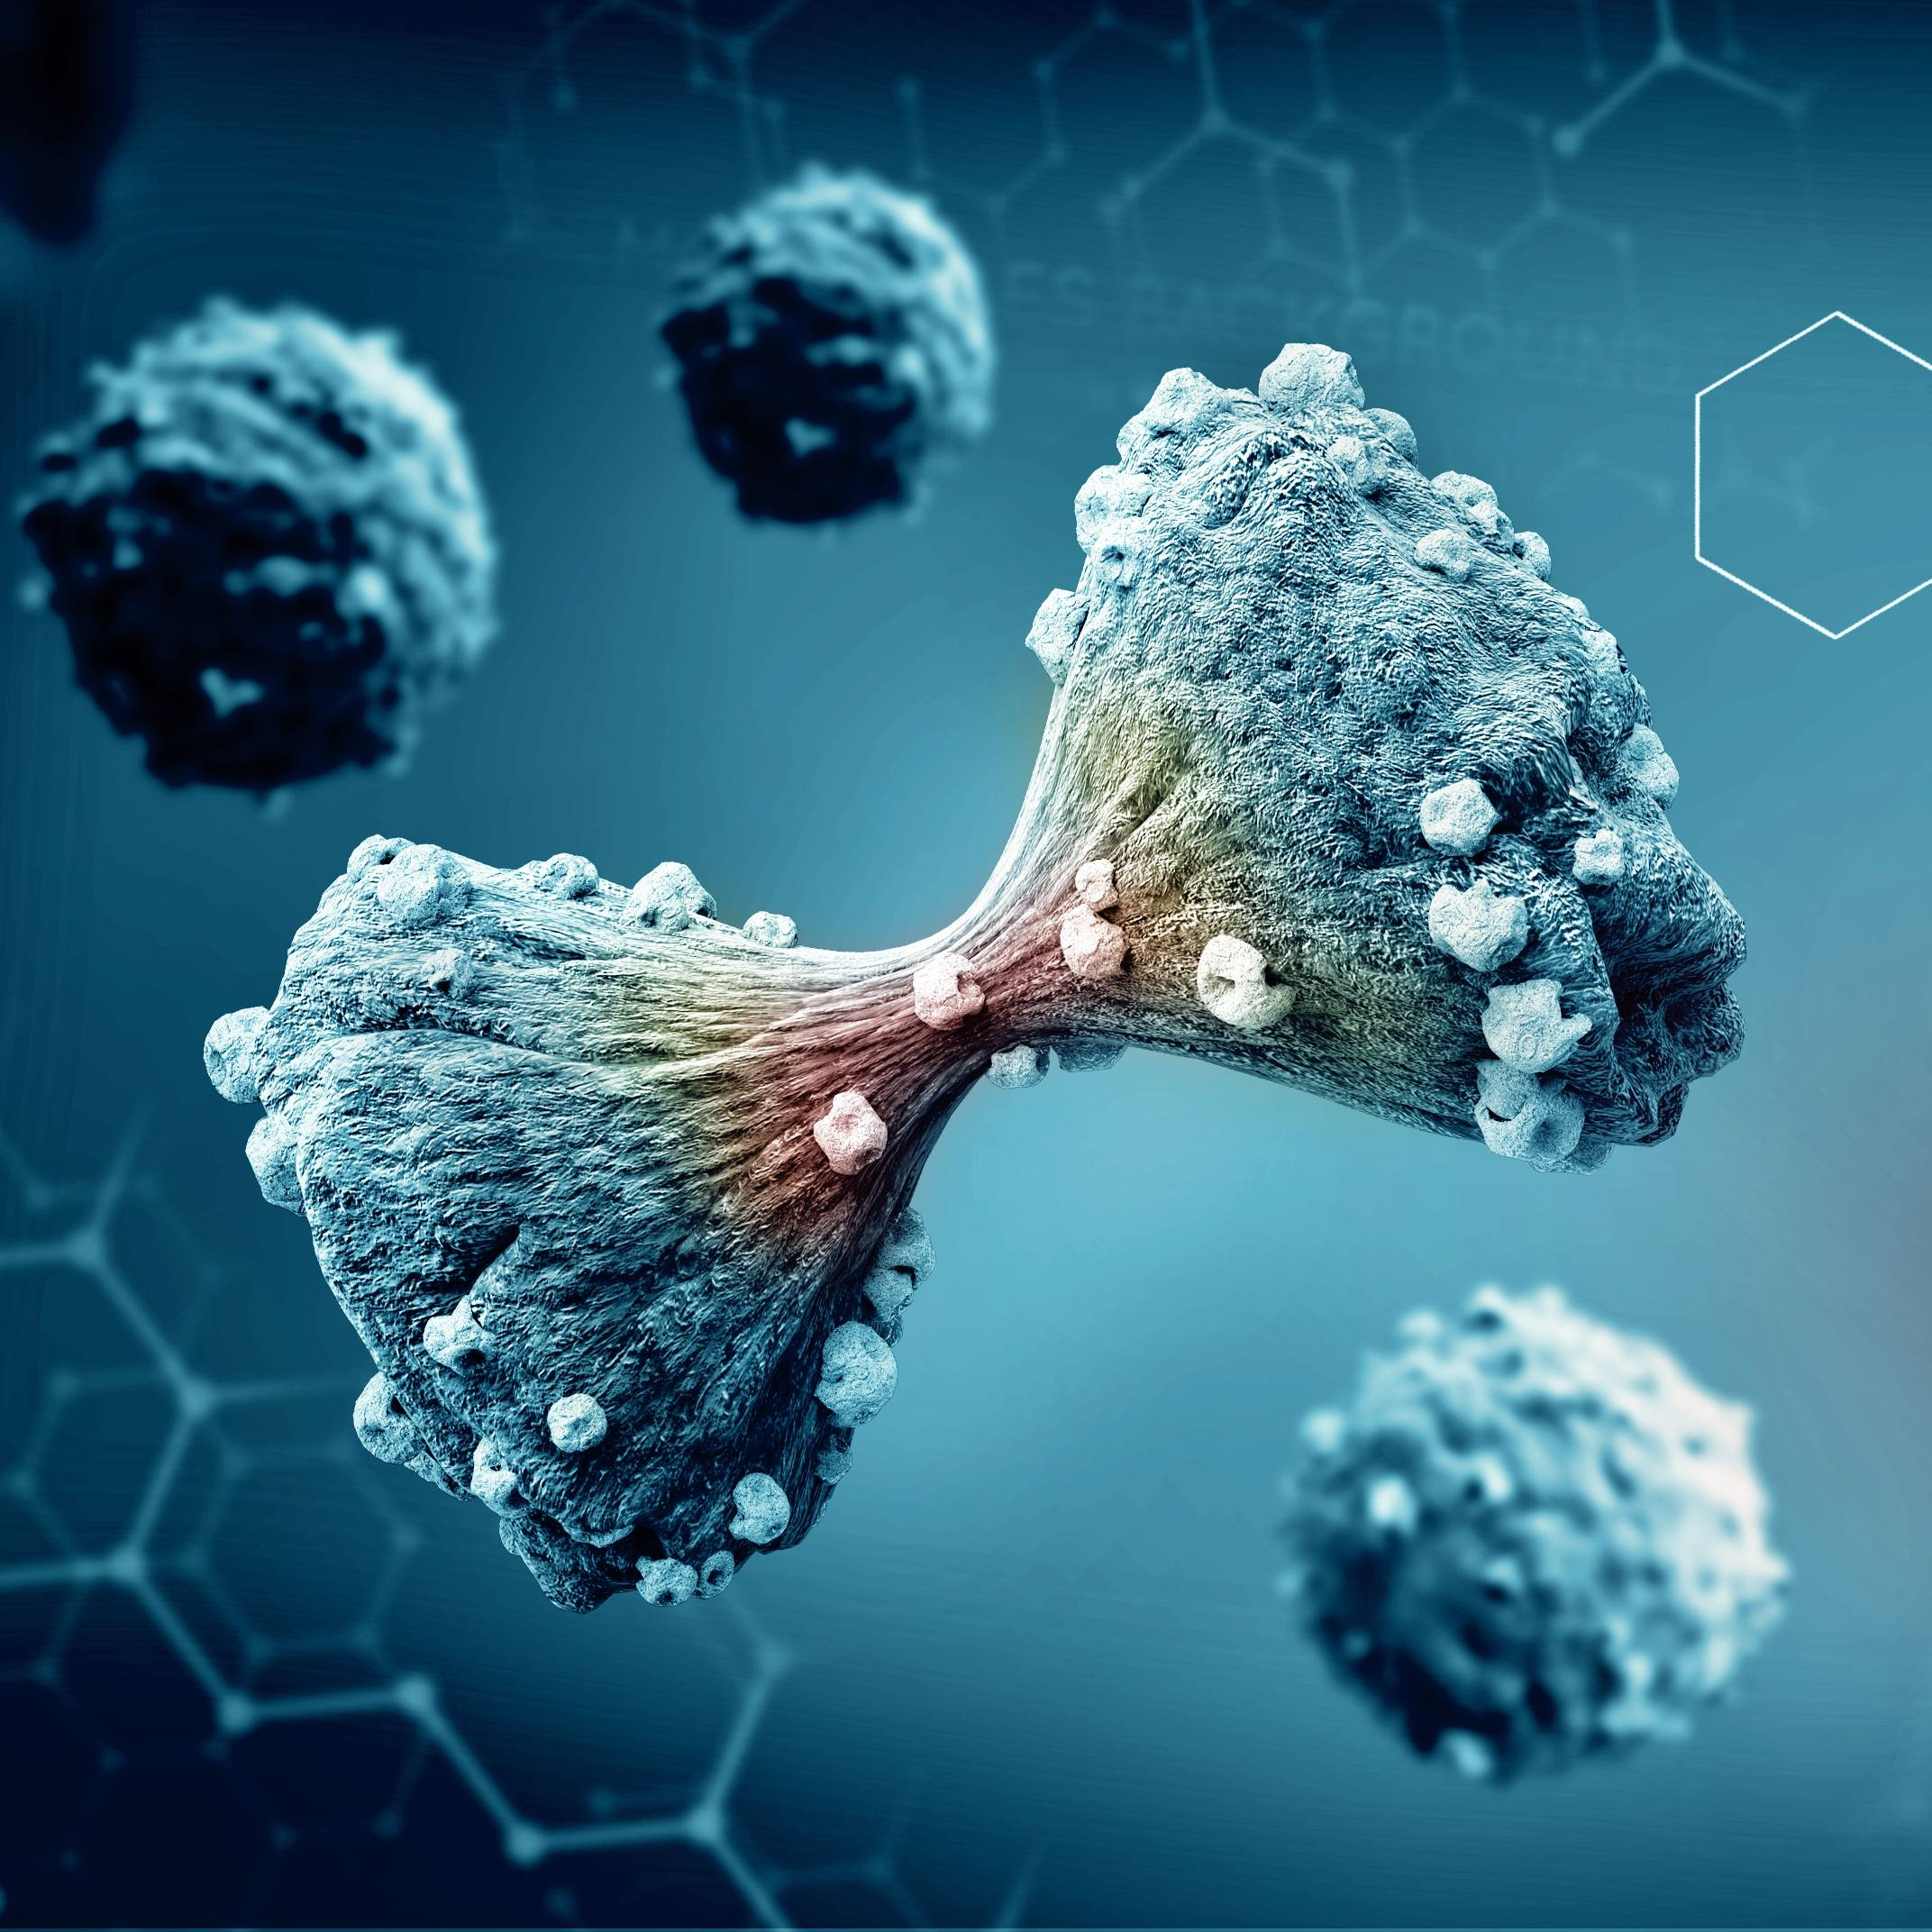 3D illustration of cancer cell dividing